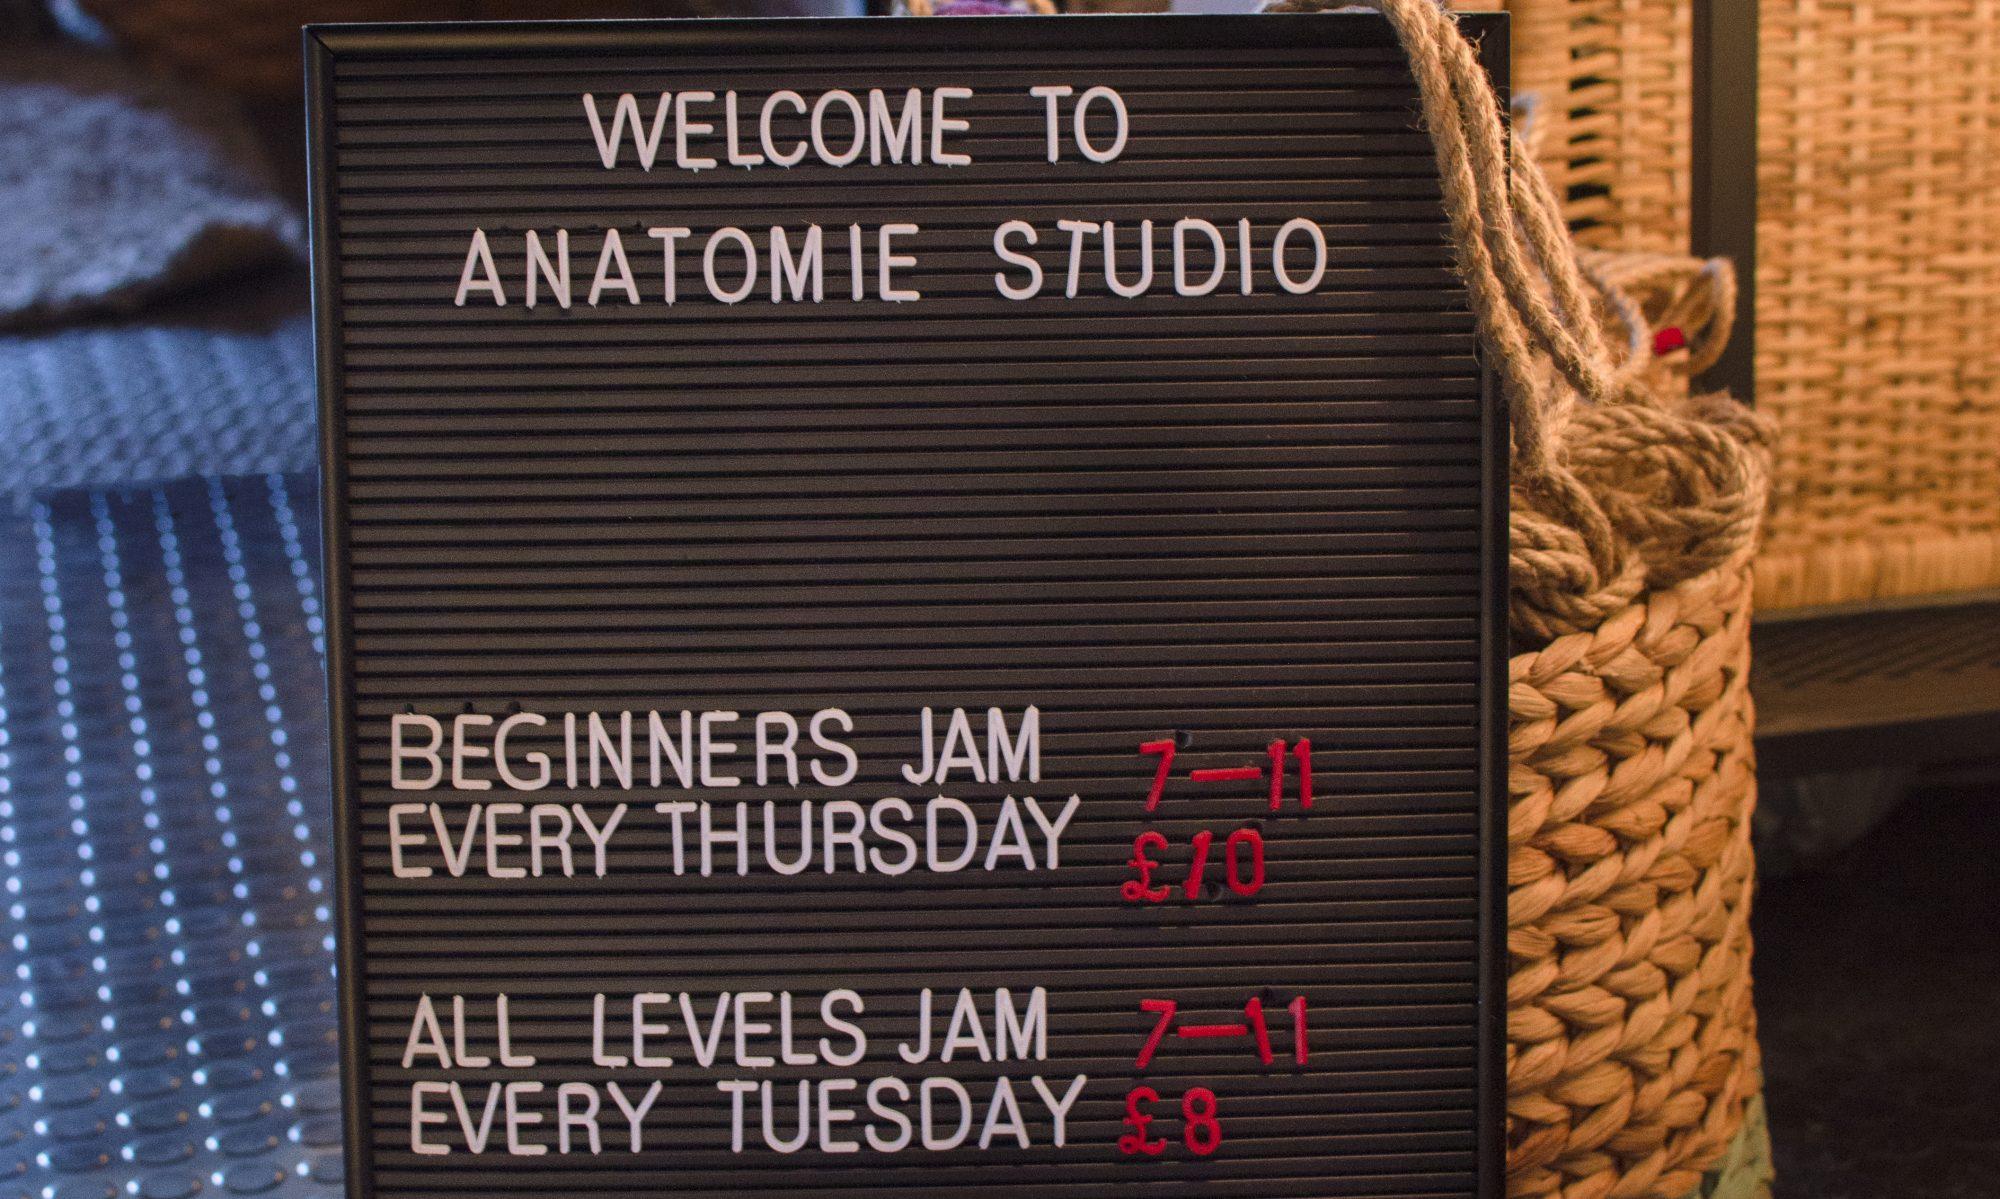 Anatomie Studio